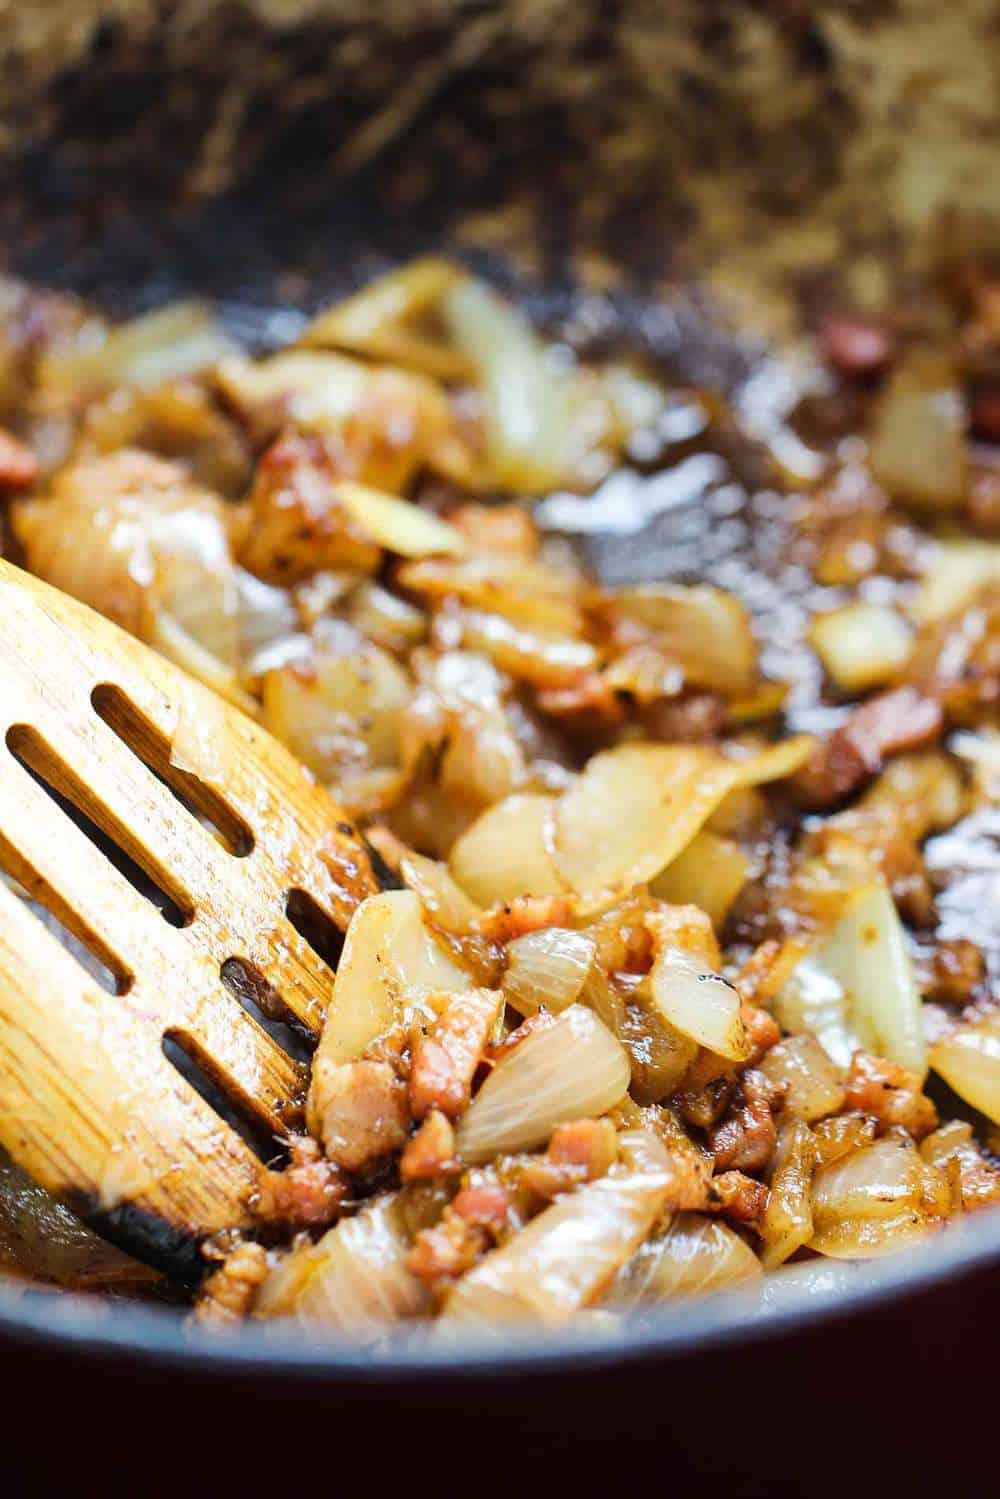 Ribeye with Gorgonzola and Caramelized Onion Sauce recipe